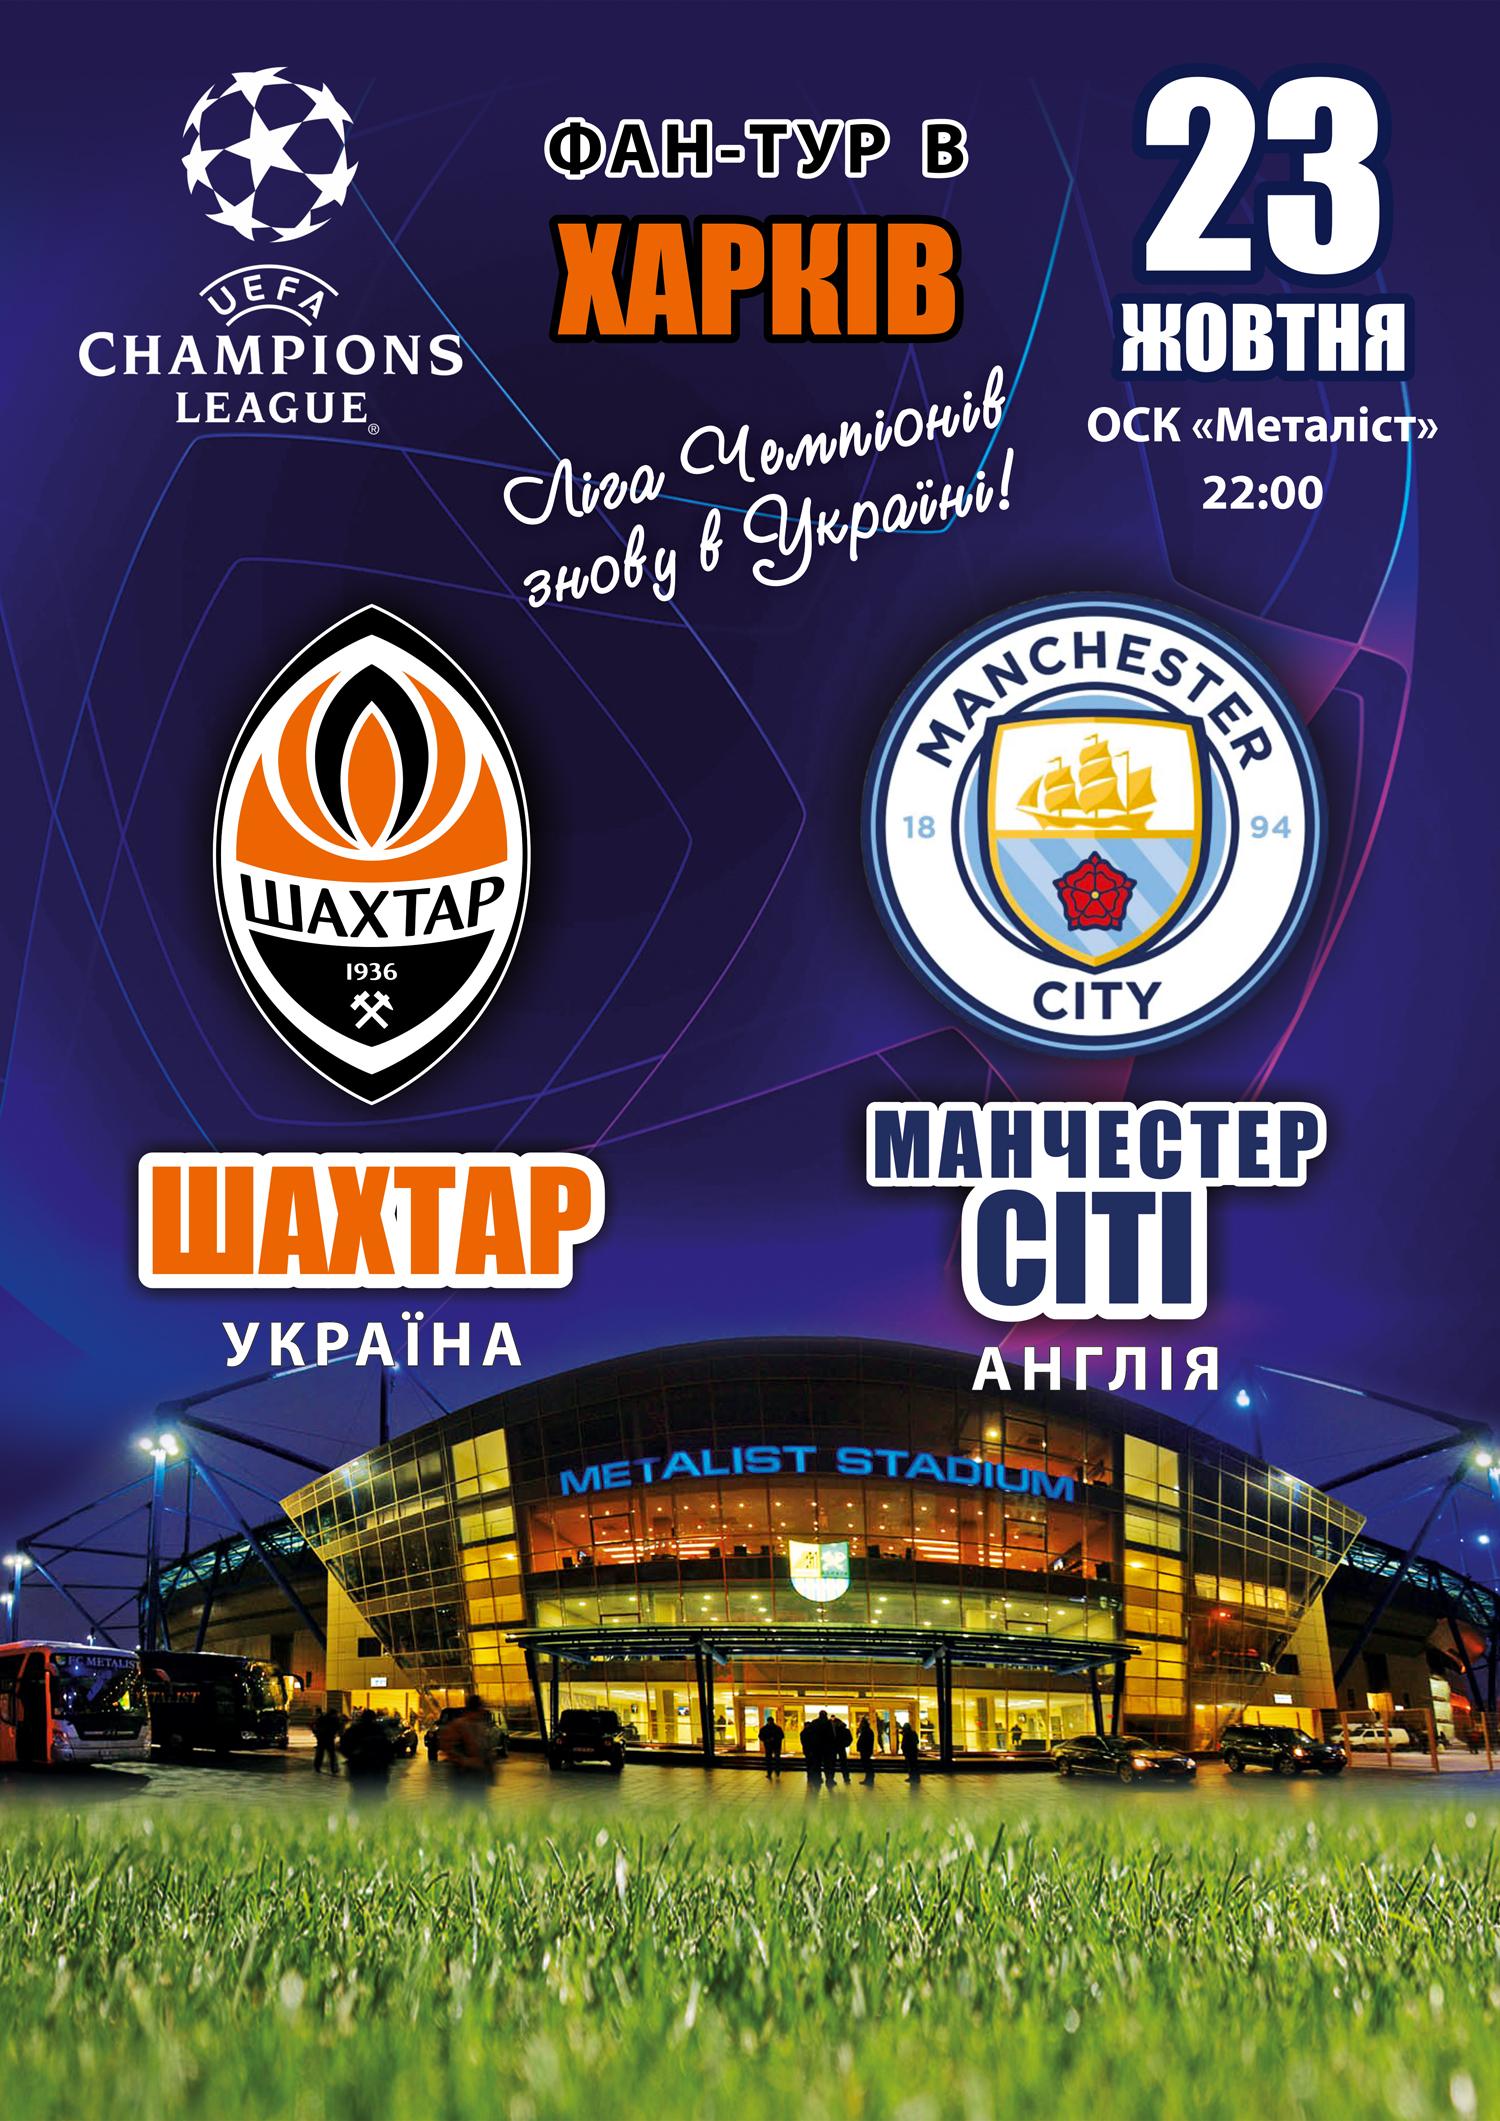 Фан-тур на матч Лиги Чемпионов Шахтер–Манчестер Сити (Мариуполь)